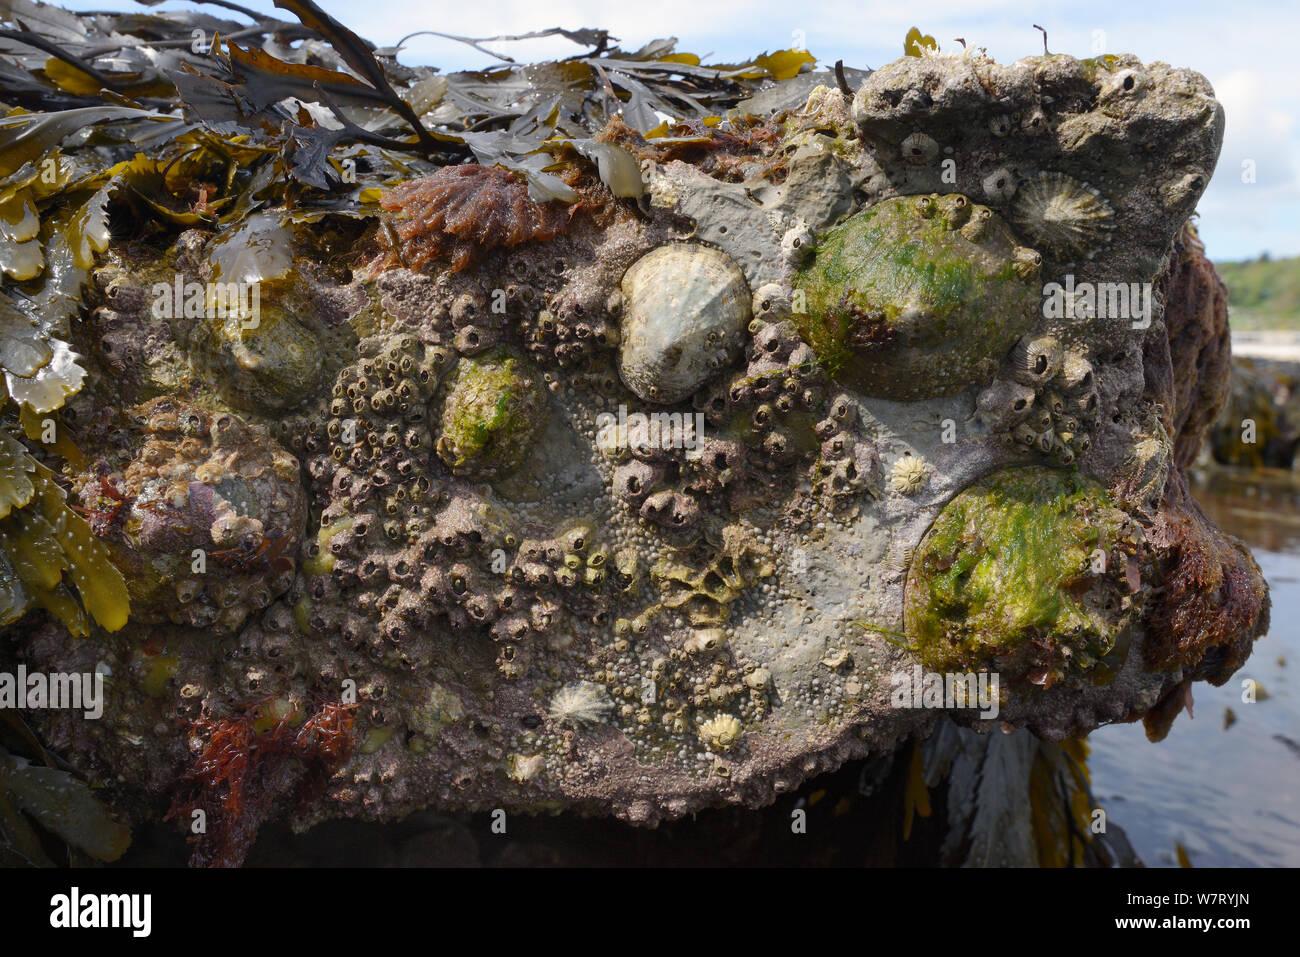 Common limpets (Patella vulgata) and Acorn barnacles (Balanus perforatus) attached to rocks exposed at low tide, Lyme Regis, Dorset, UK, April. Stock Photo